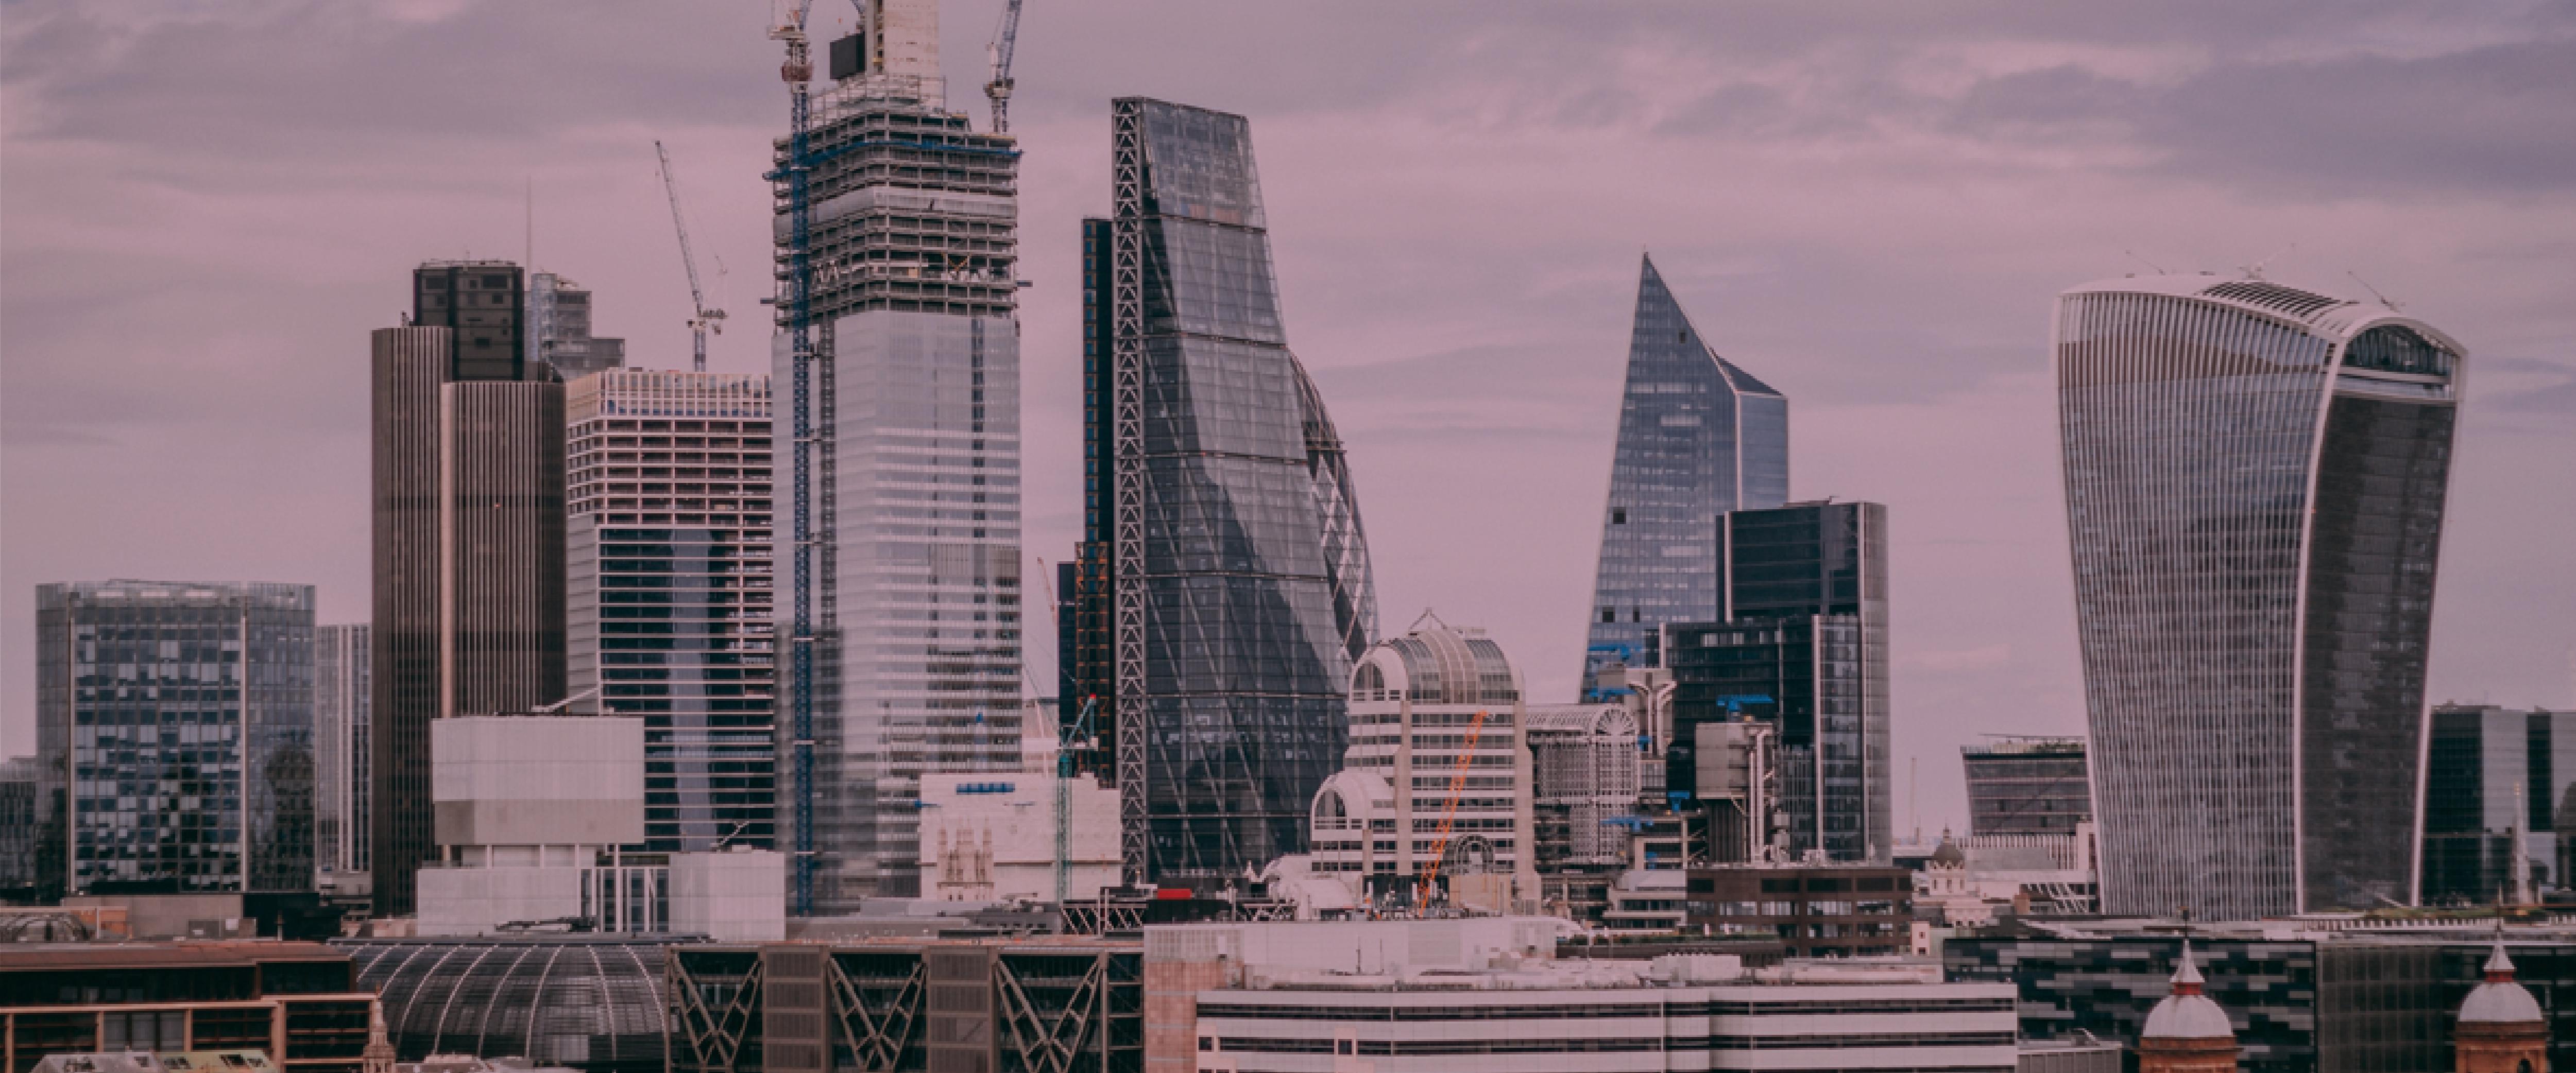 london skyline overlay